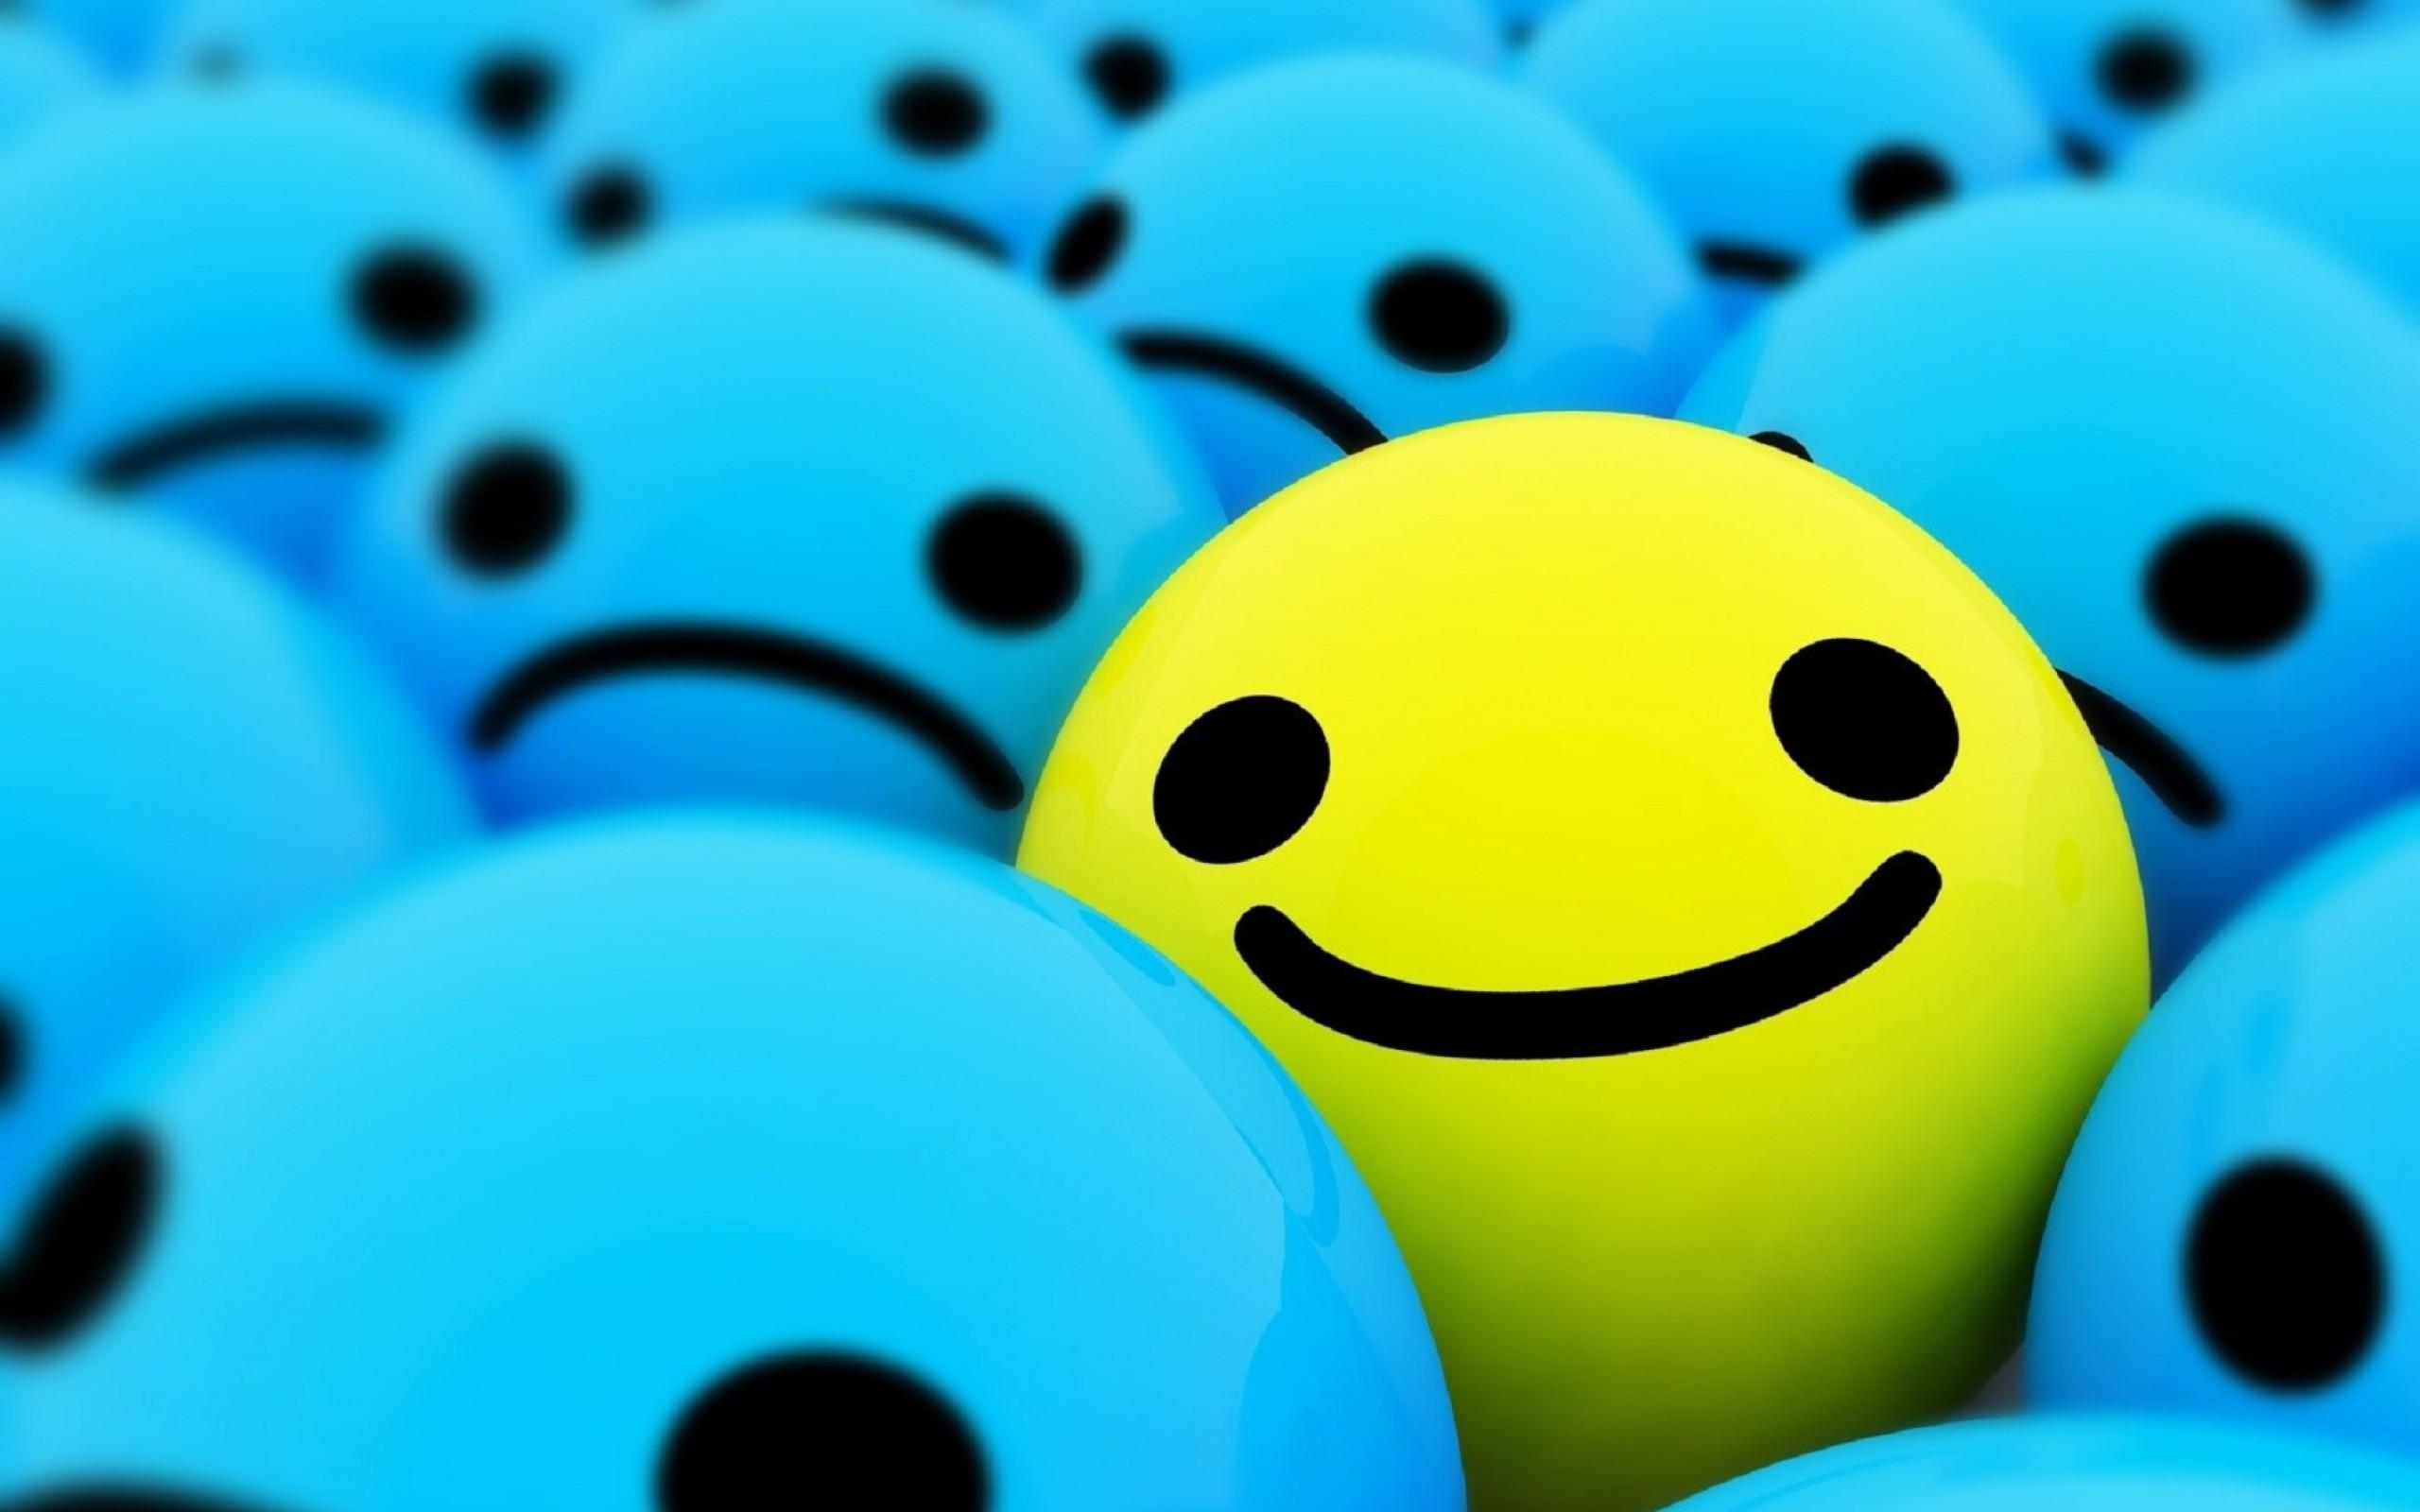 Happy-smiling-faces-3d-1600×2560